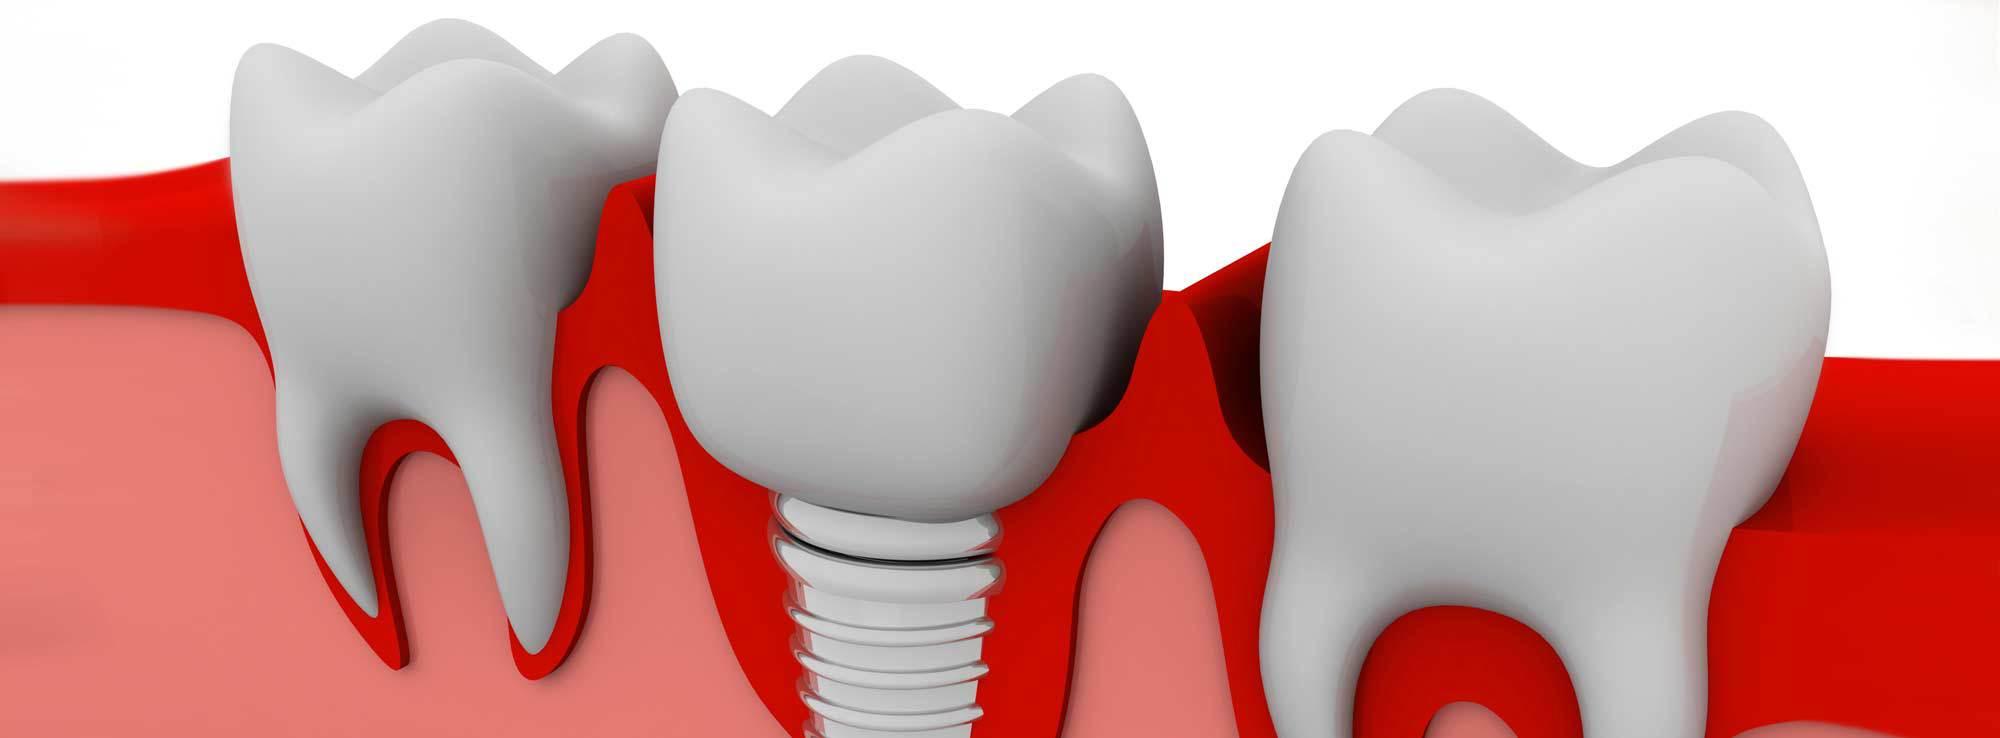 Bone Grafting Treatment by Nassau County Periodontist Dr. Marichia Attalla